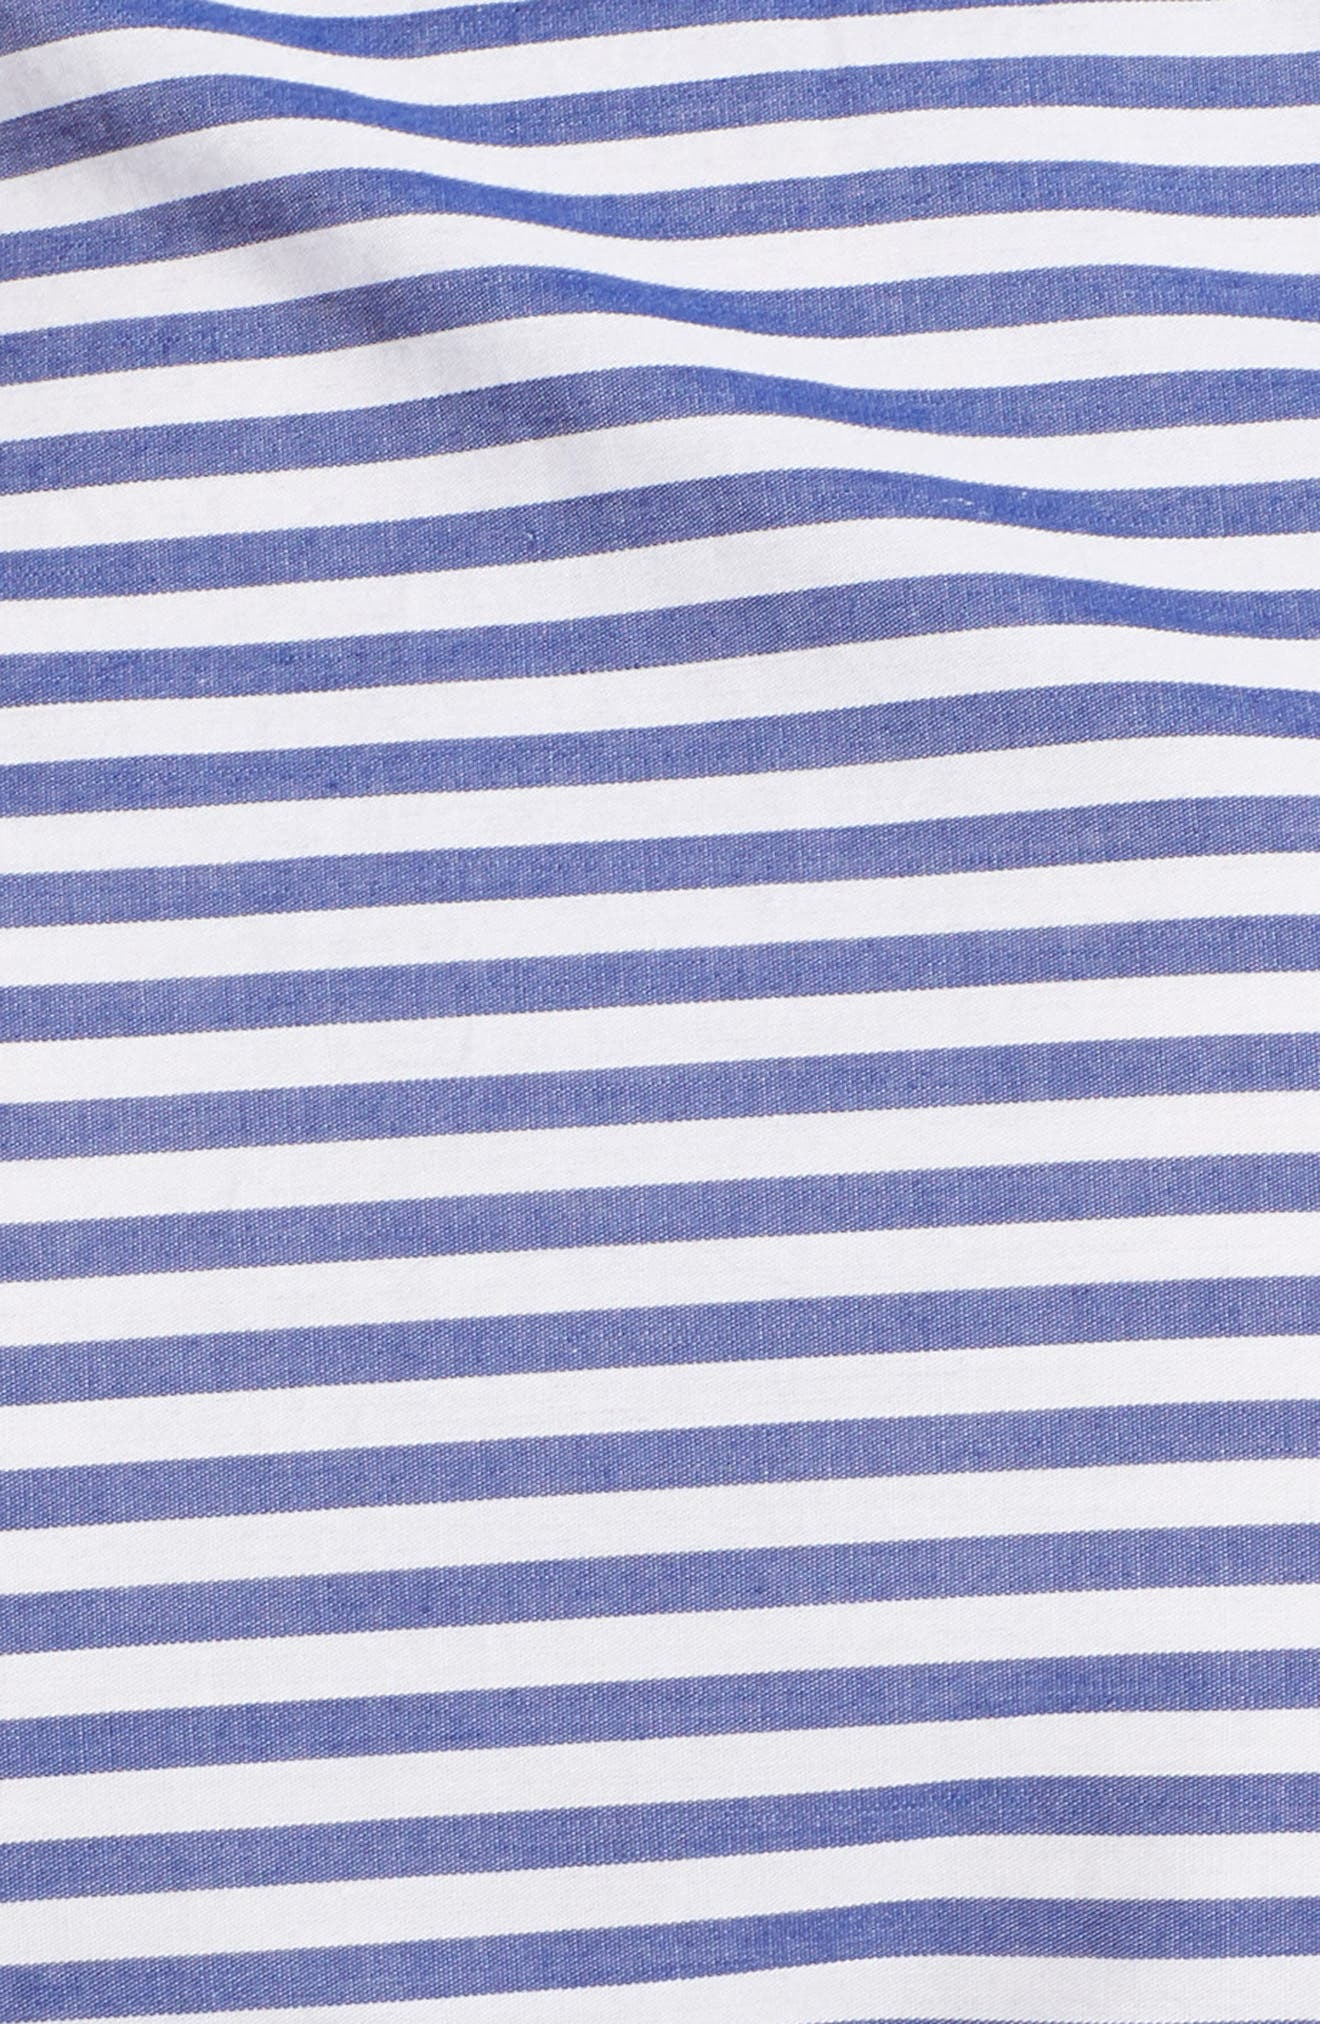 Stripe Ruched Cotton Shirtdress,                             Alternate thumbnail 12, color,                             Blue White Stripe